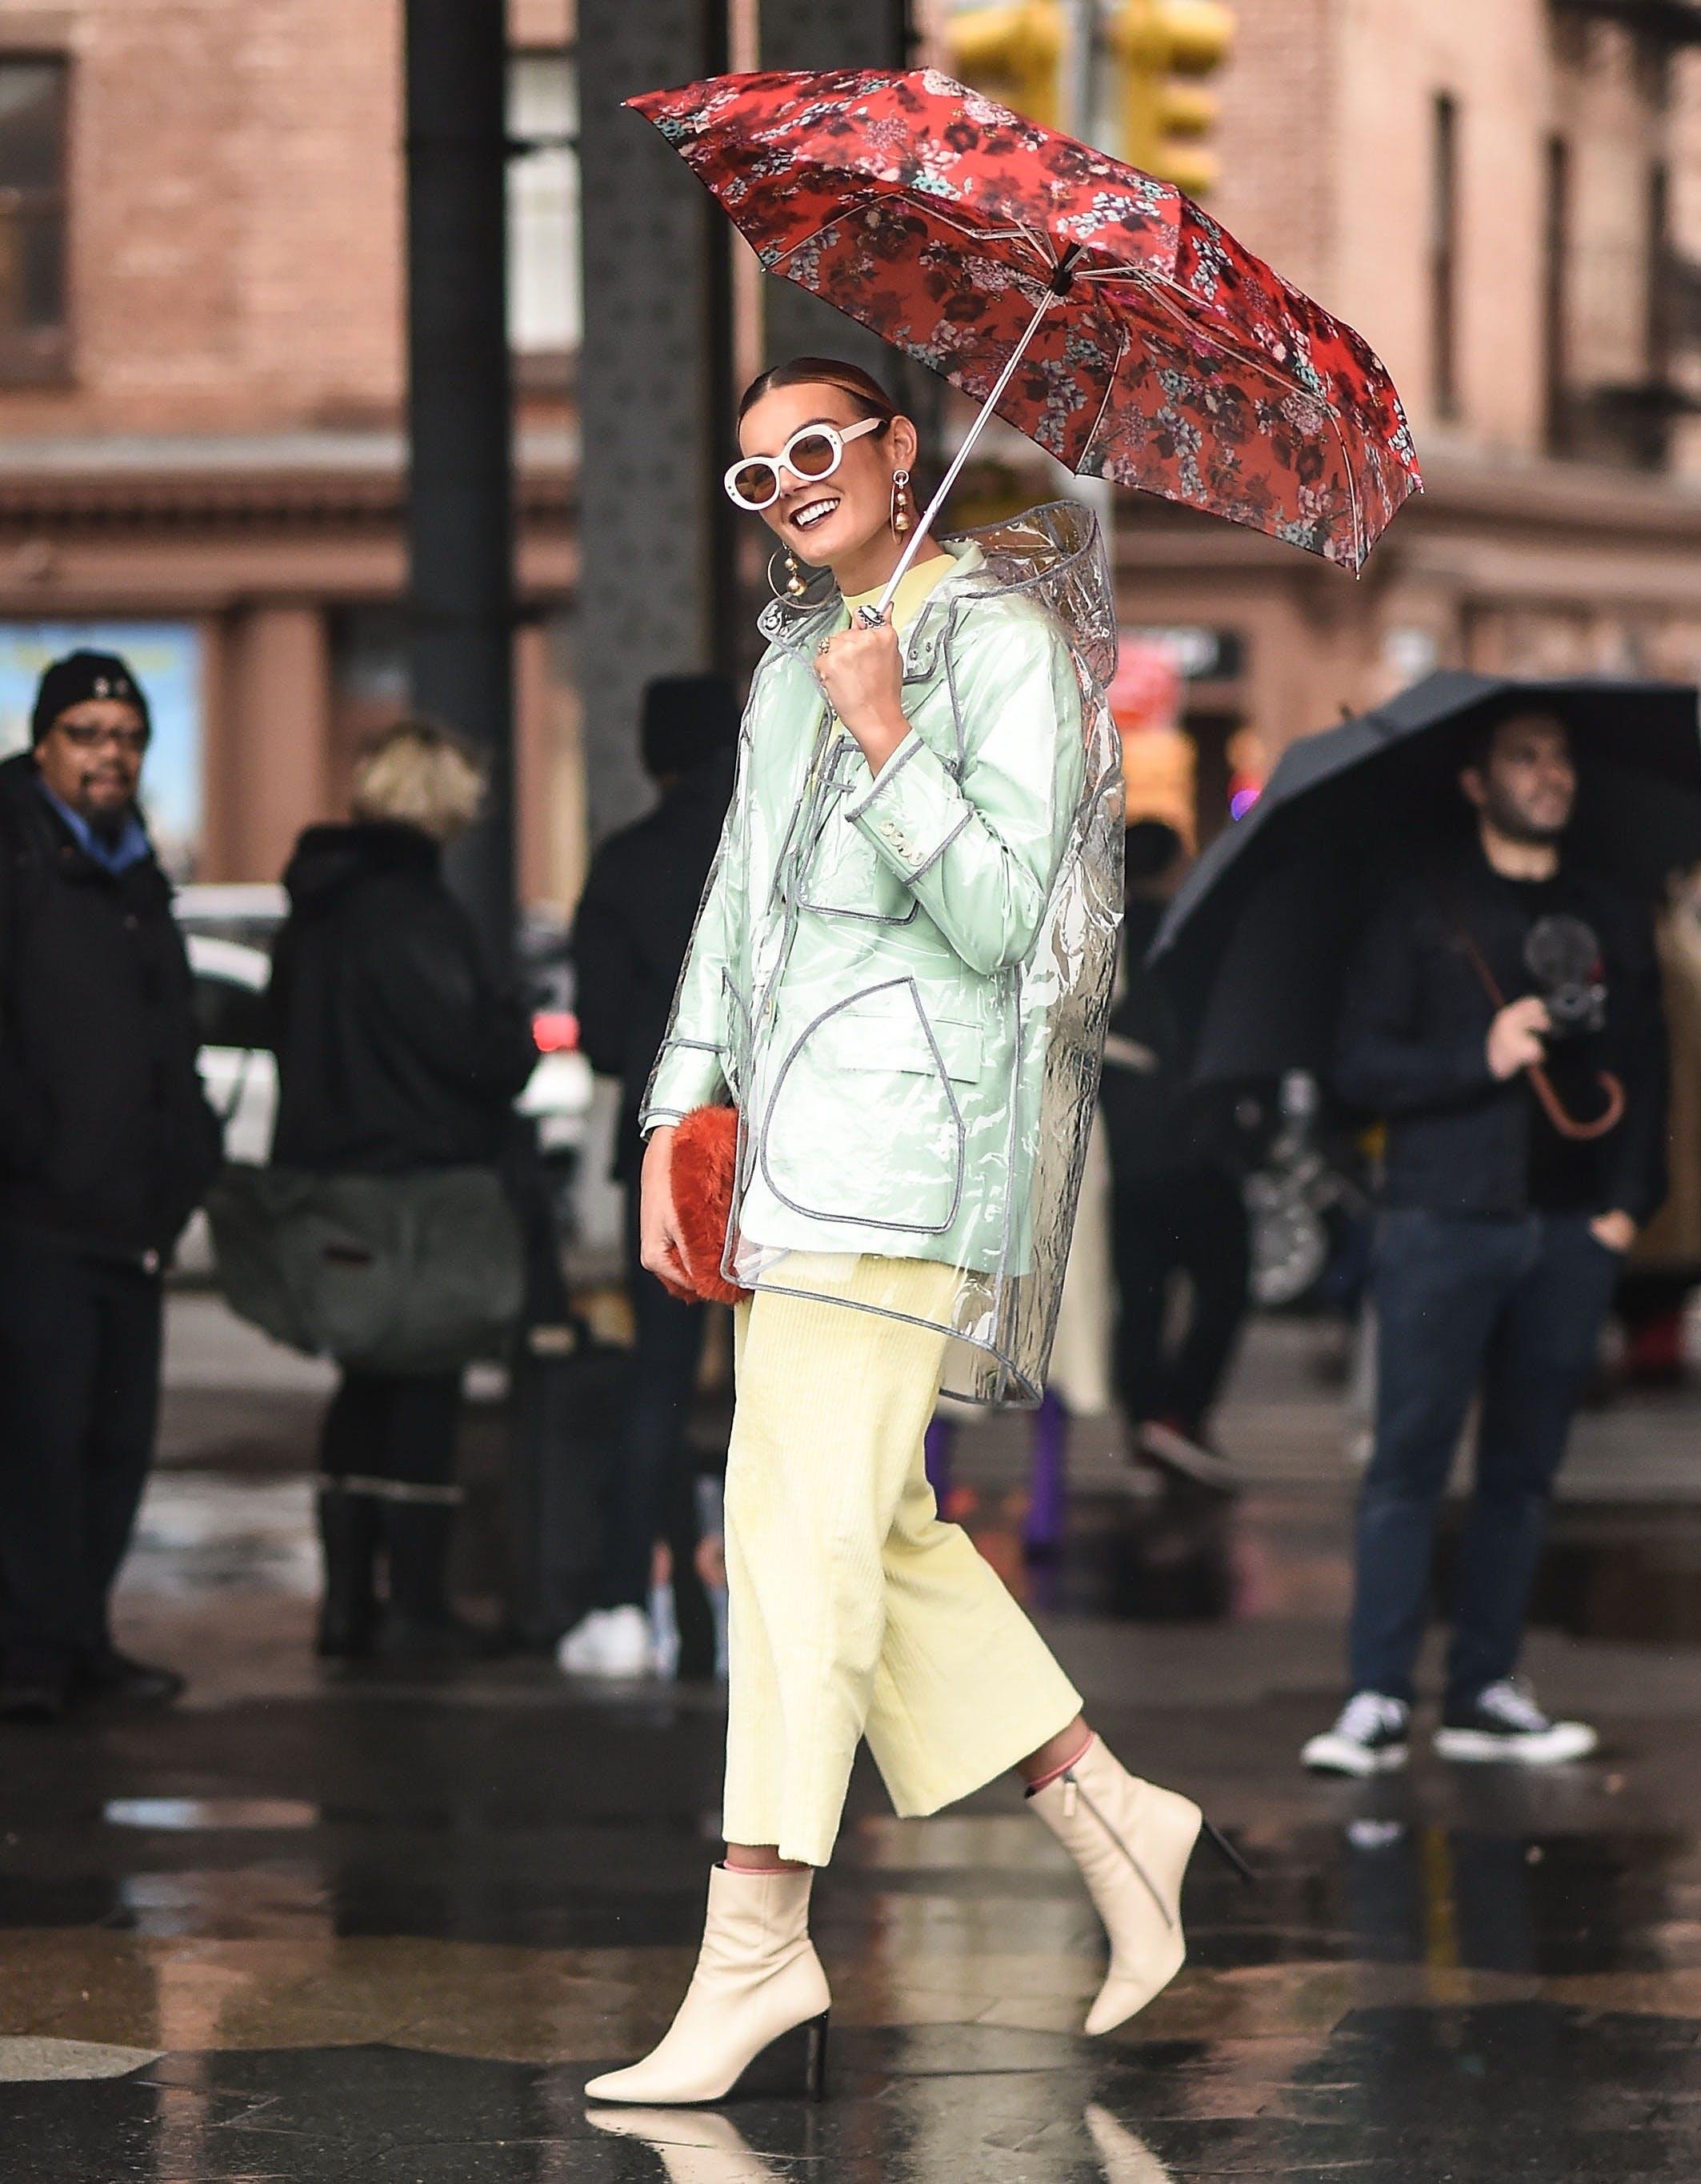 woman wearing fun rain gear